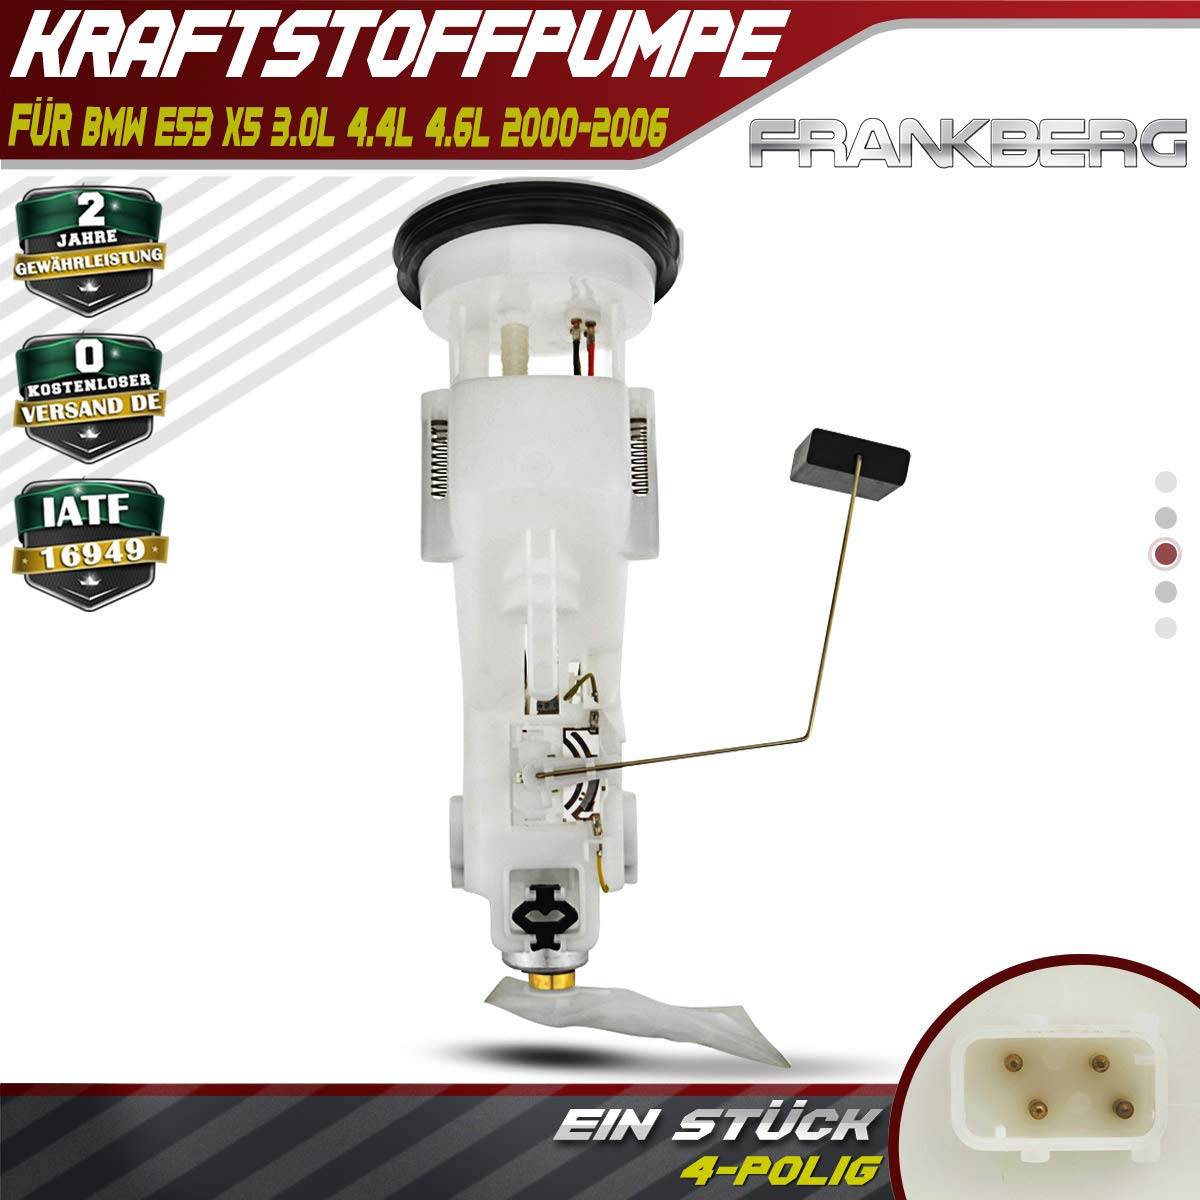 Kraftstoffpumpe F/ördereinheit Benzinpumpe f/ür X5 E53 3.0L 4.4L 4.6L 2000-2006 16116753898